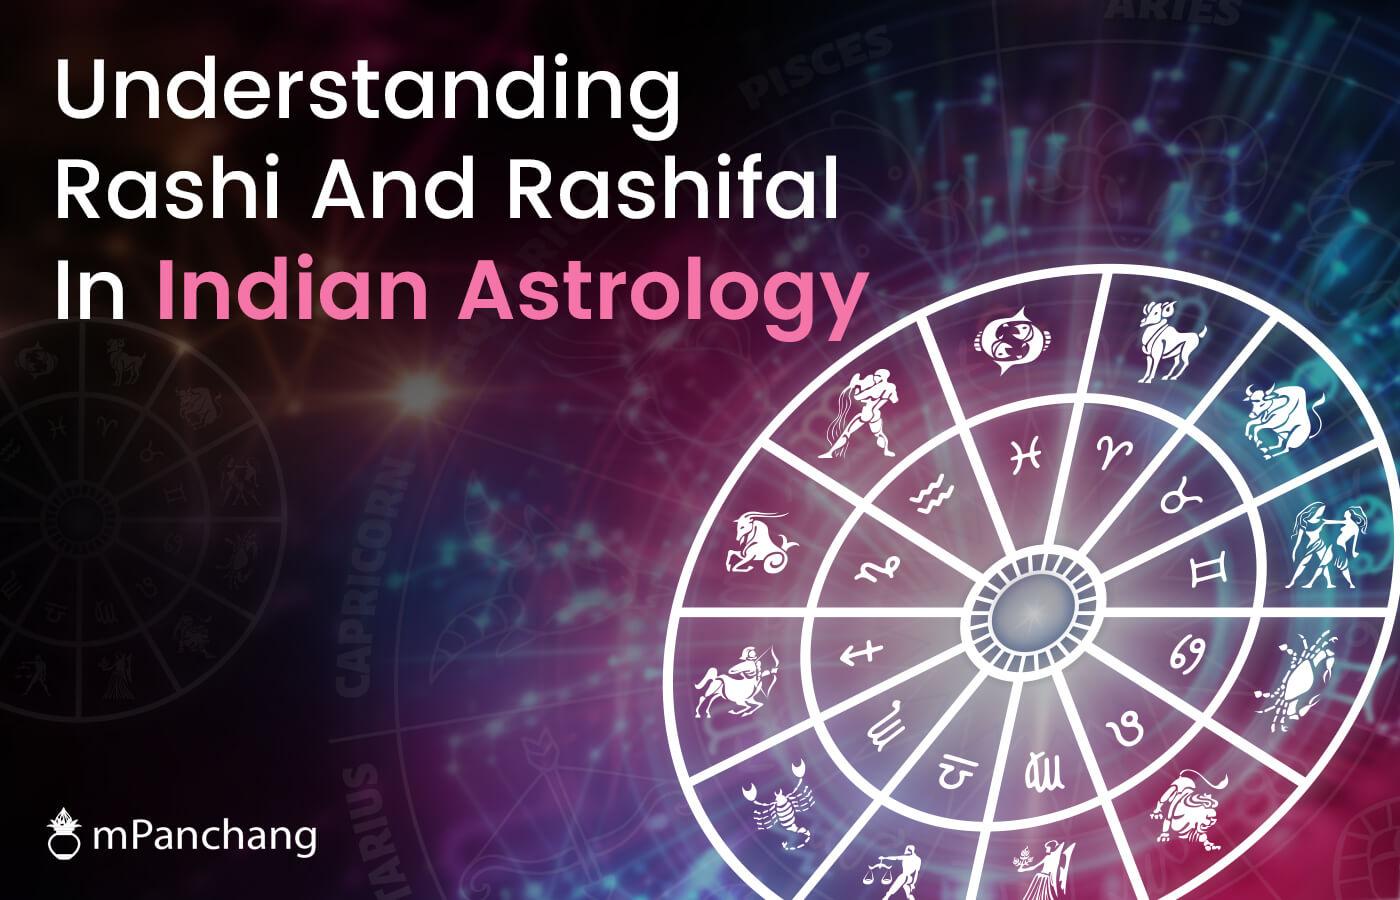 Understanding Rashi And Rashifal In Indian Astrology